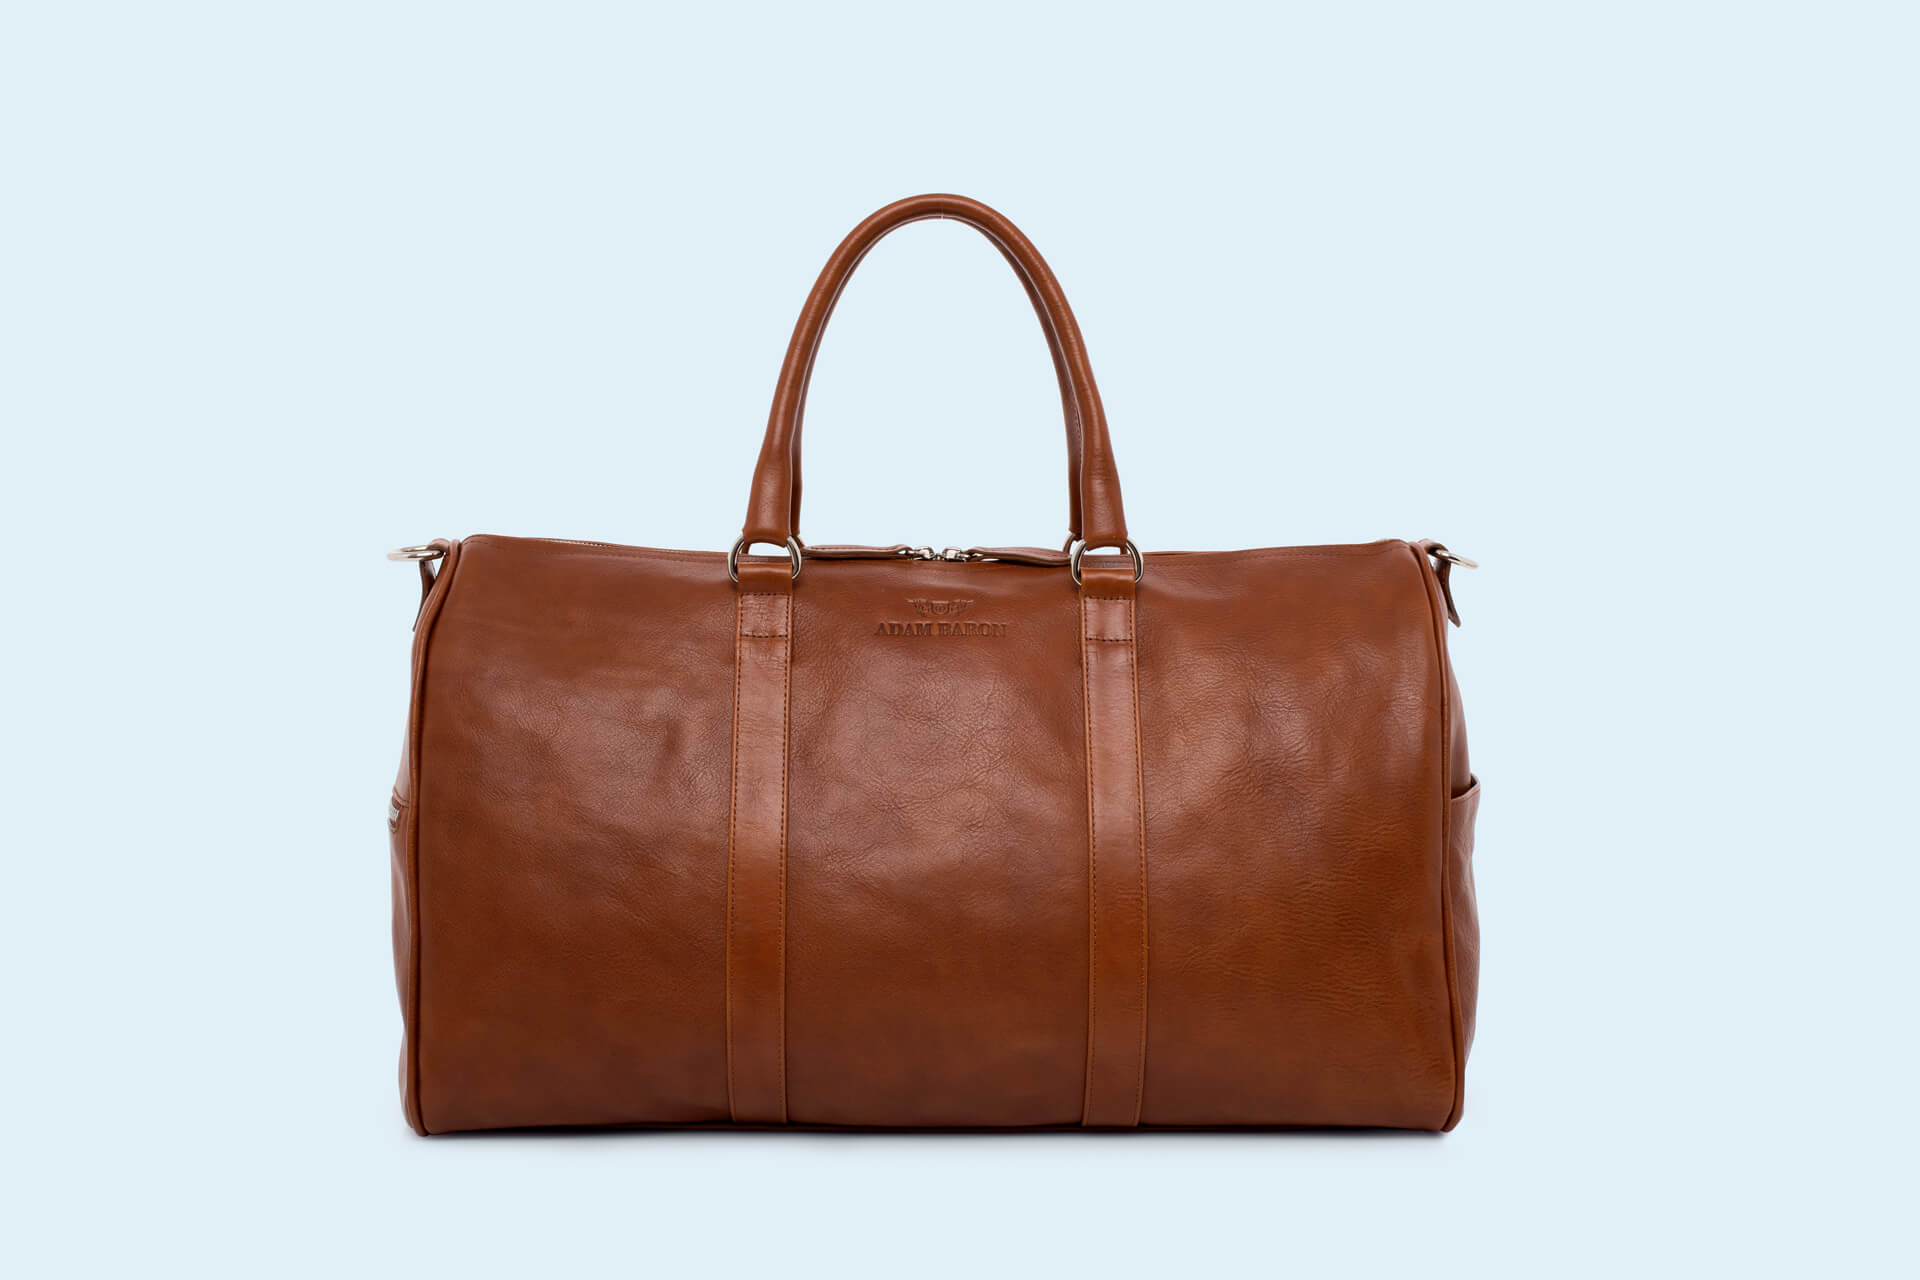 d2ac07068b1d2 Skórzana torba podróżna - Nonconformist Travel cognac   ADAM BARON